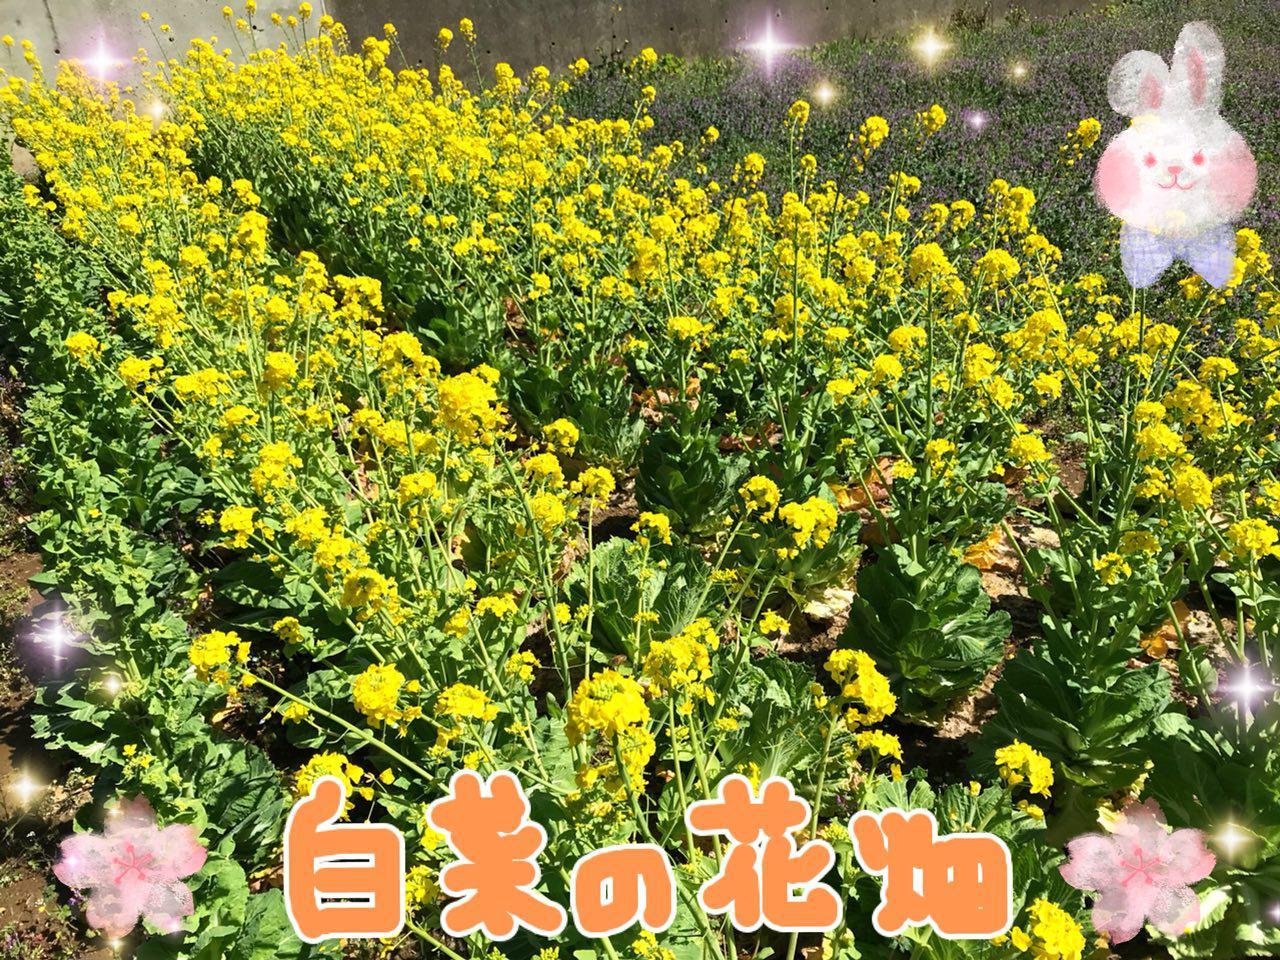 photo_2018-03-23_22-43-30.jpg